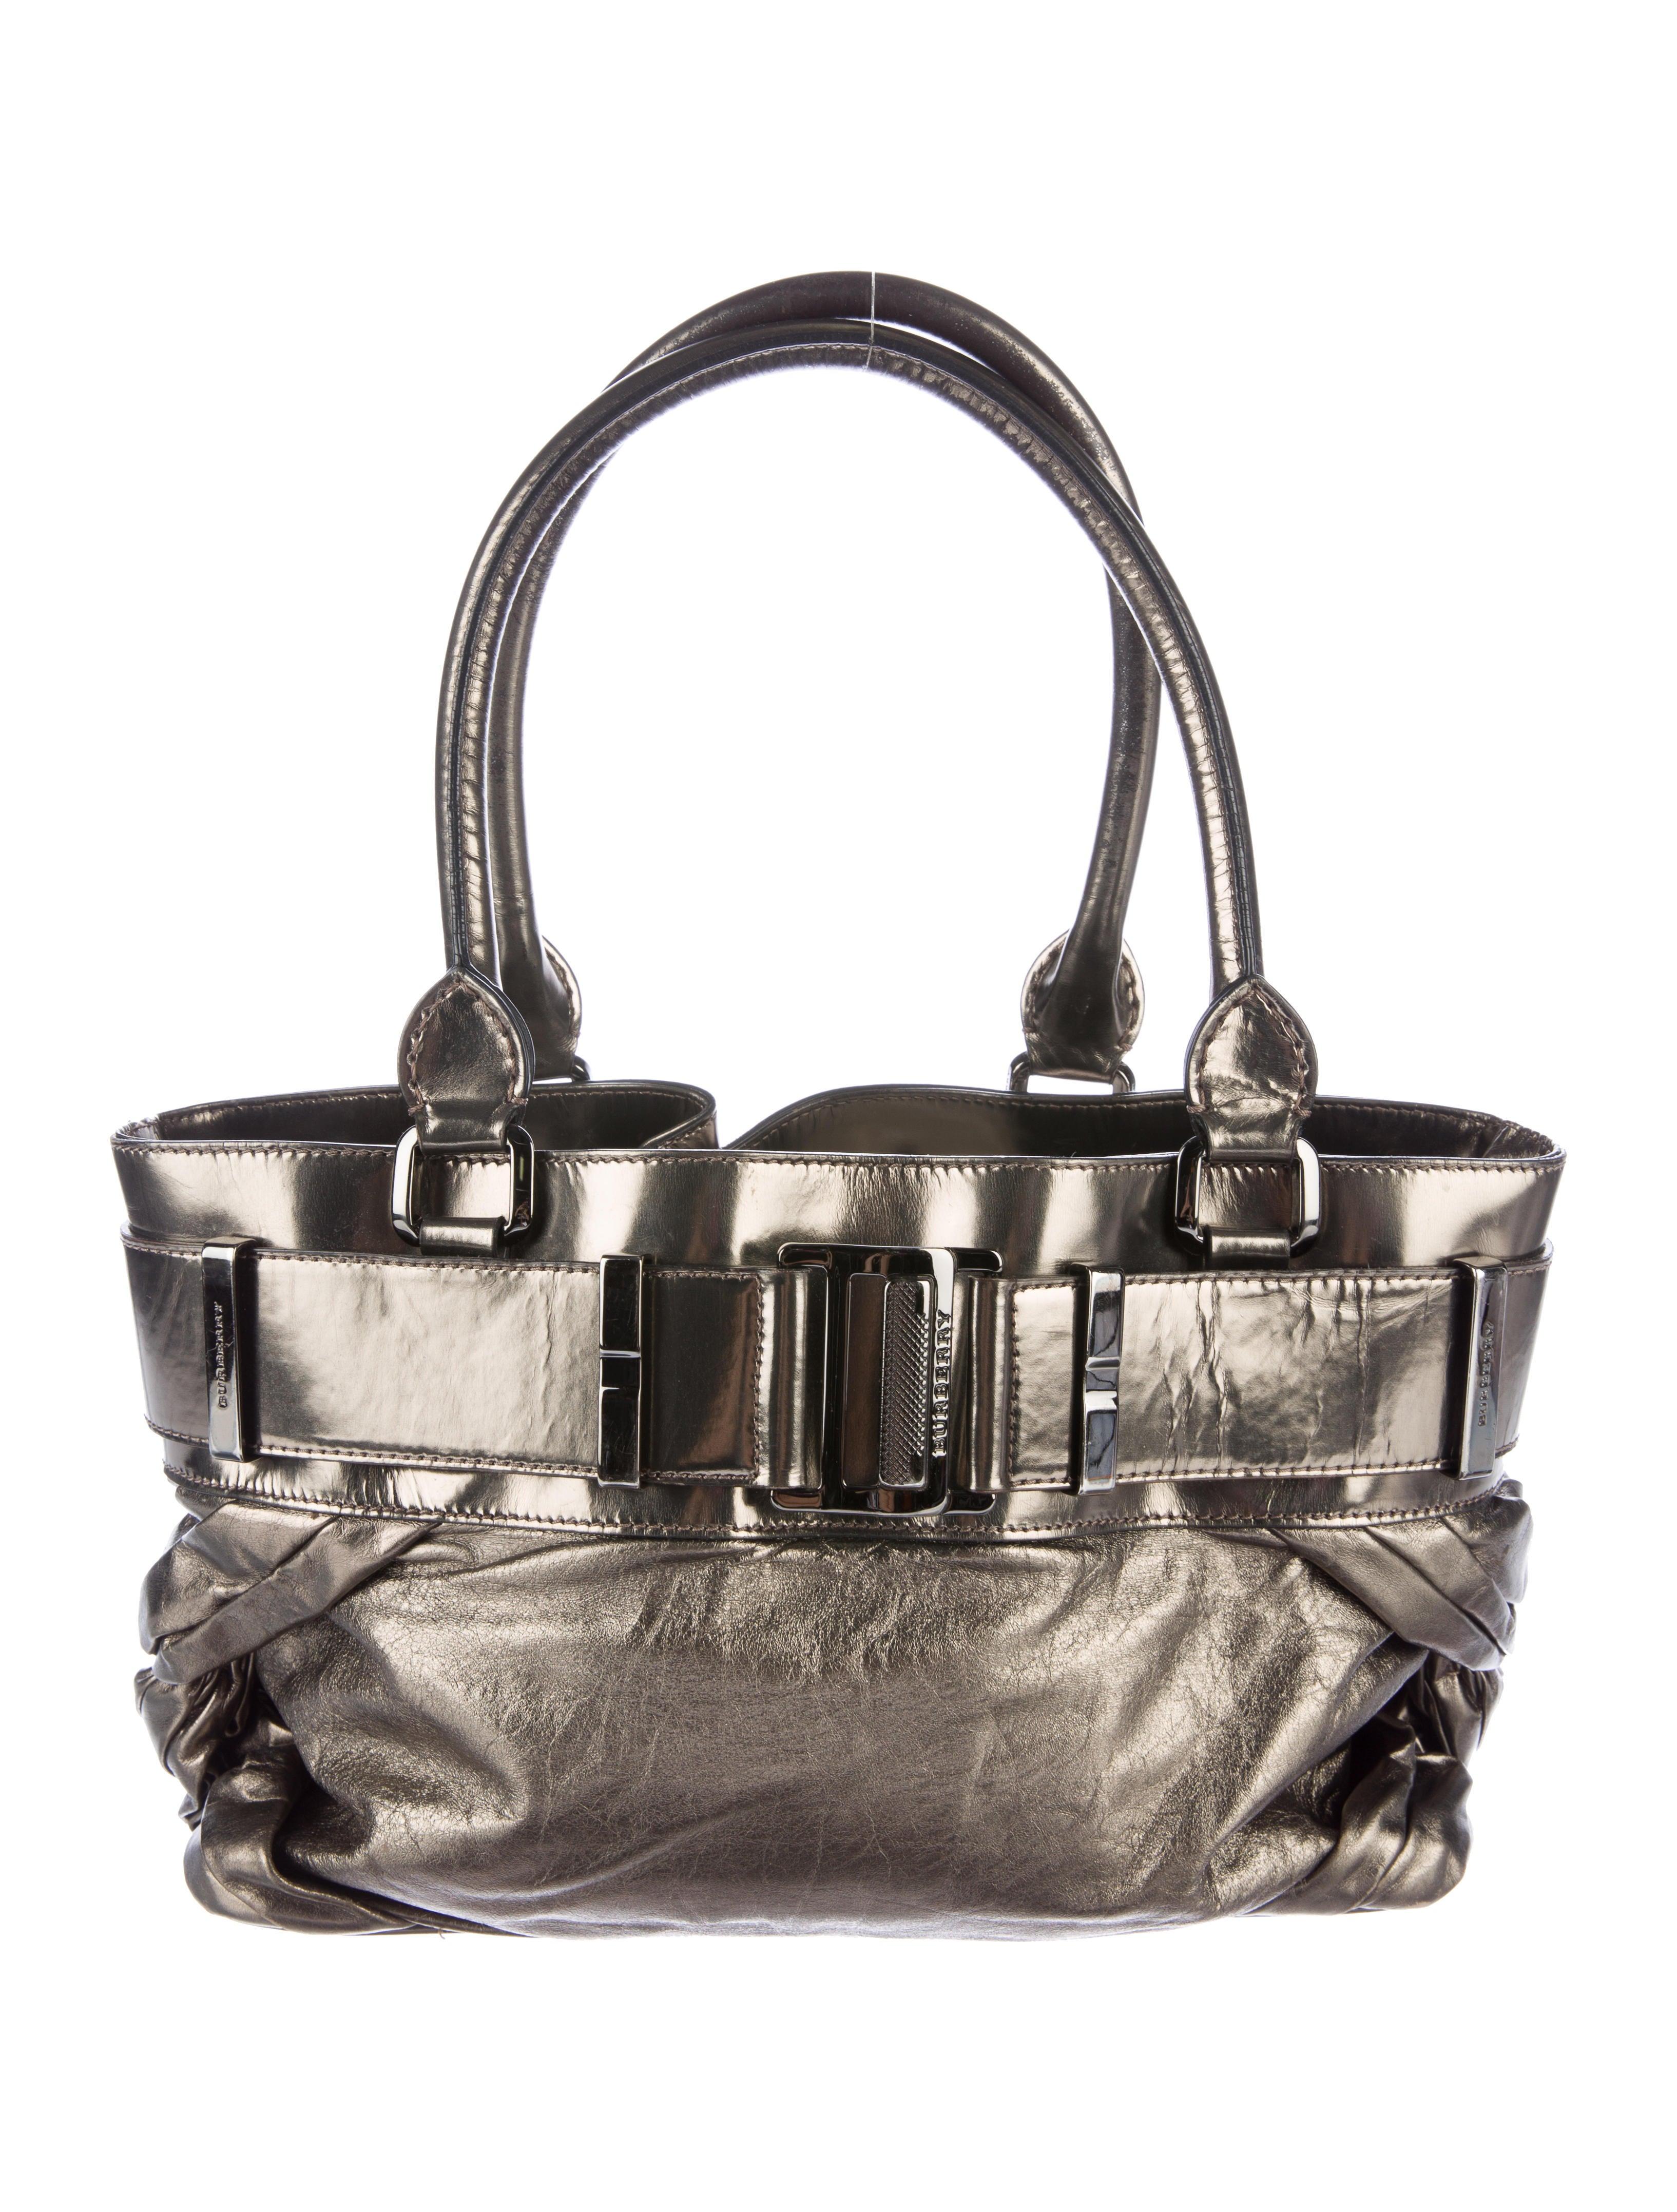 Contemporary Flatware Burberry Metallic Leather Shoulder Bag Handbags